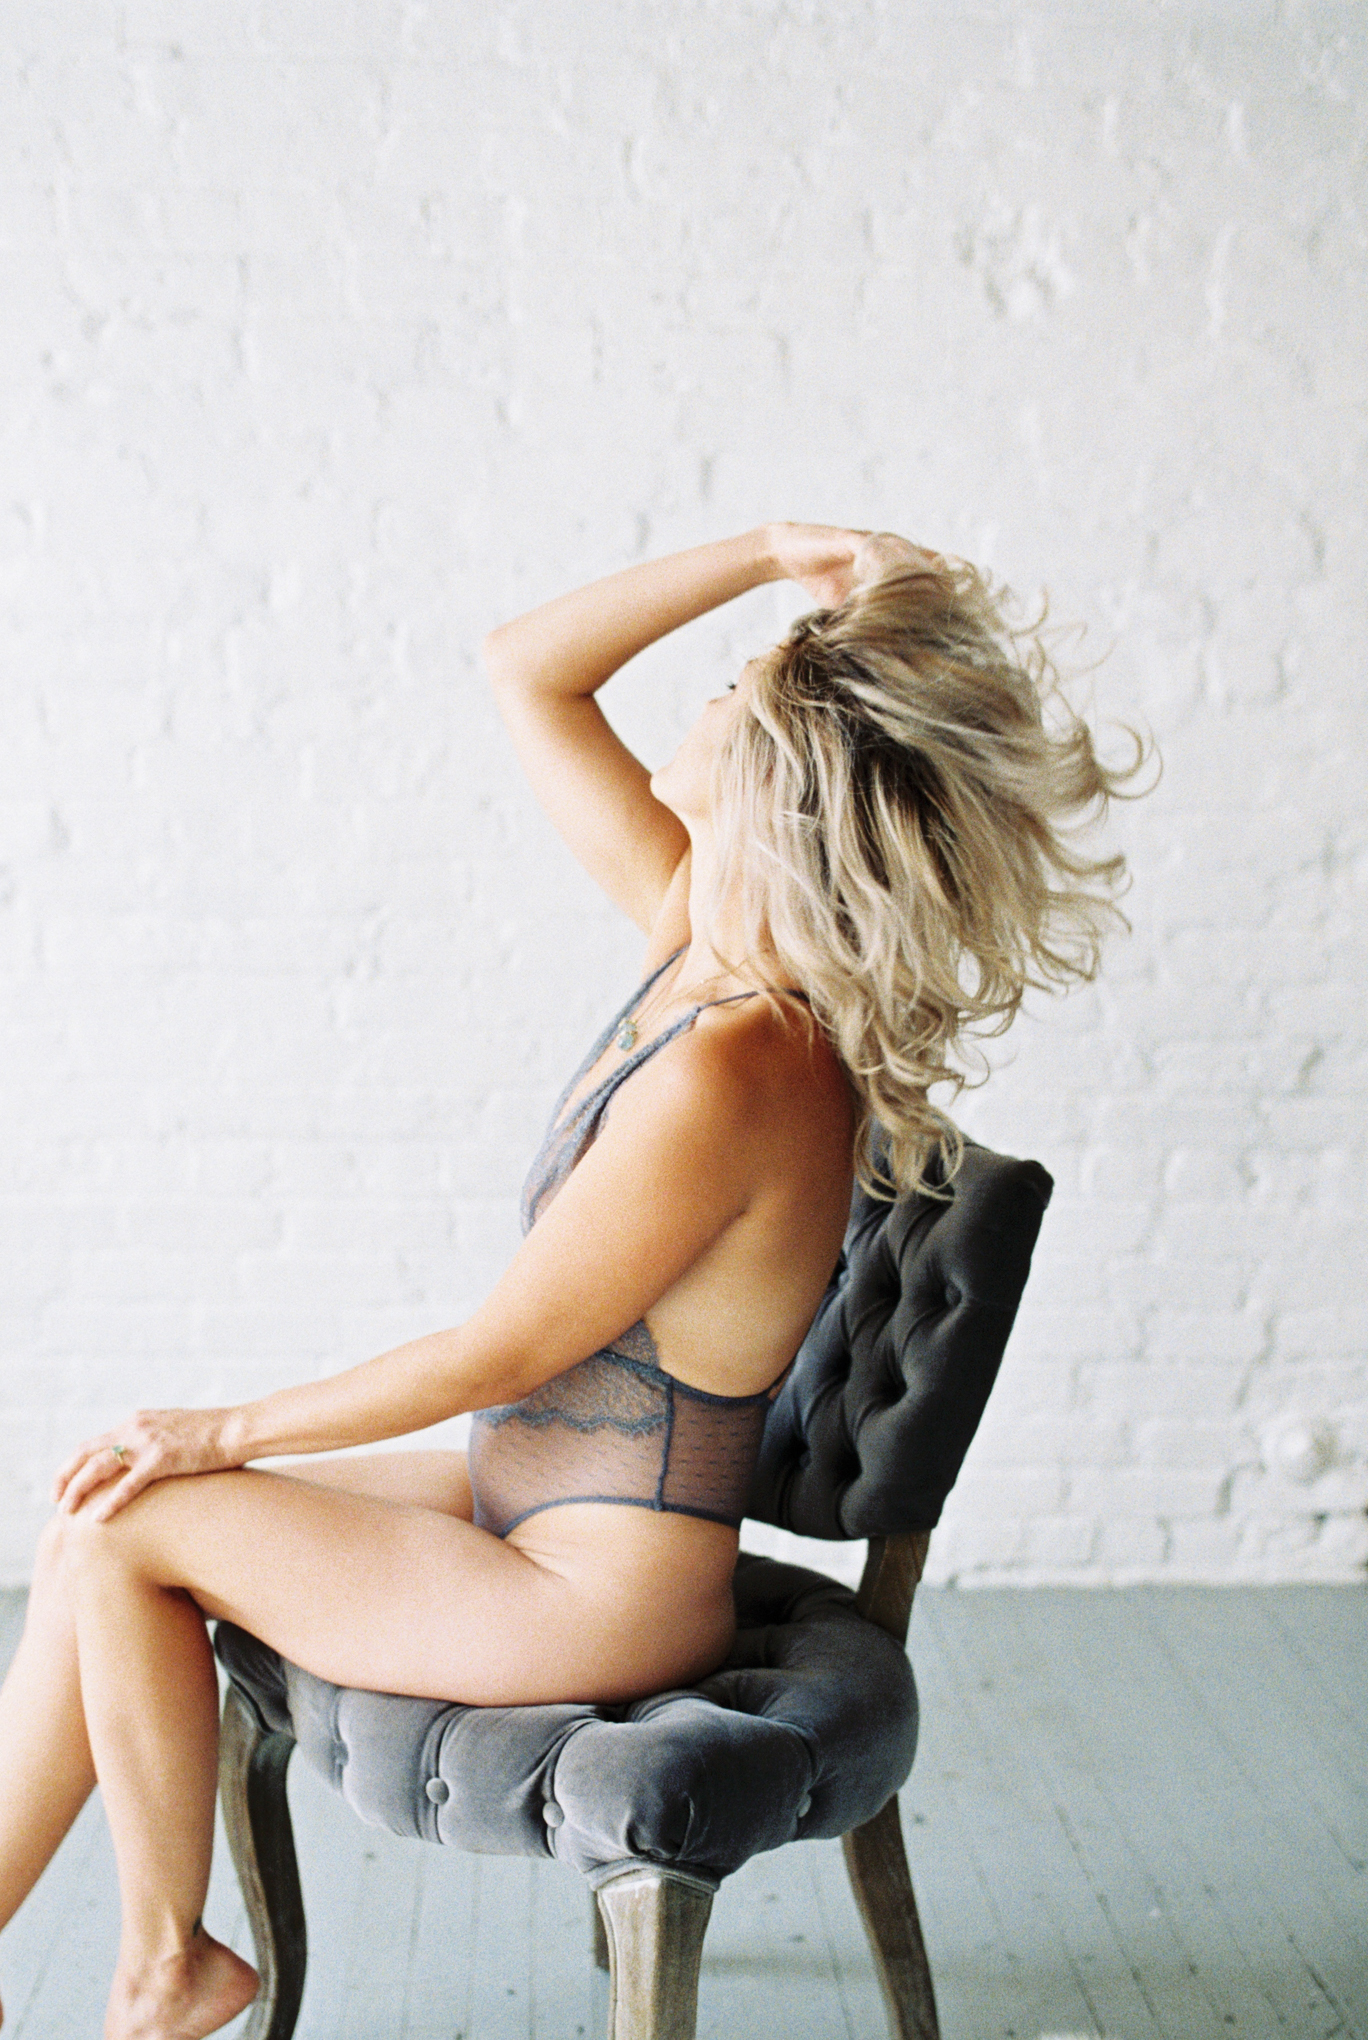 IGDayton_Boudoir_Photographer_Tonya_Espy_Photography-1.jpg